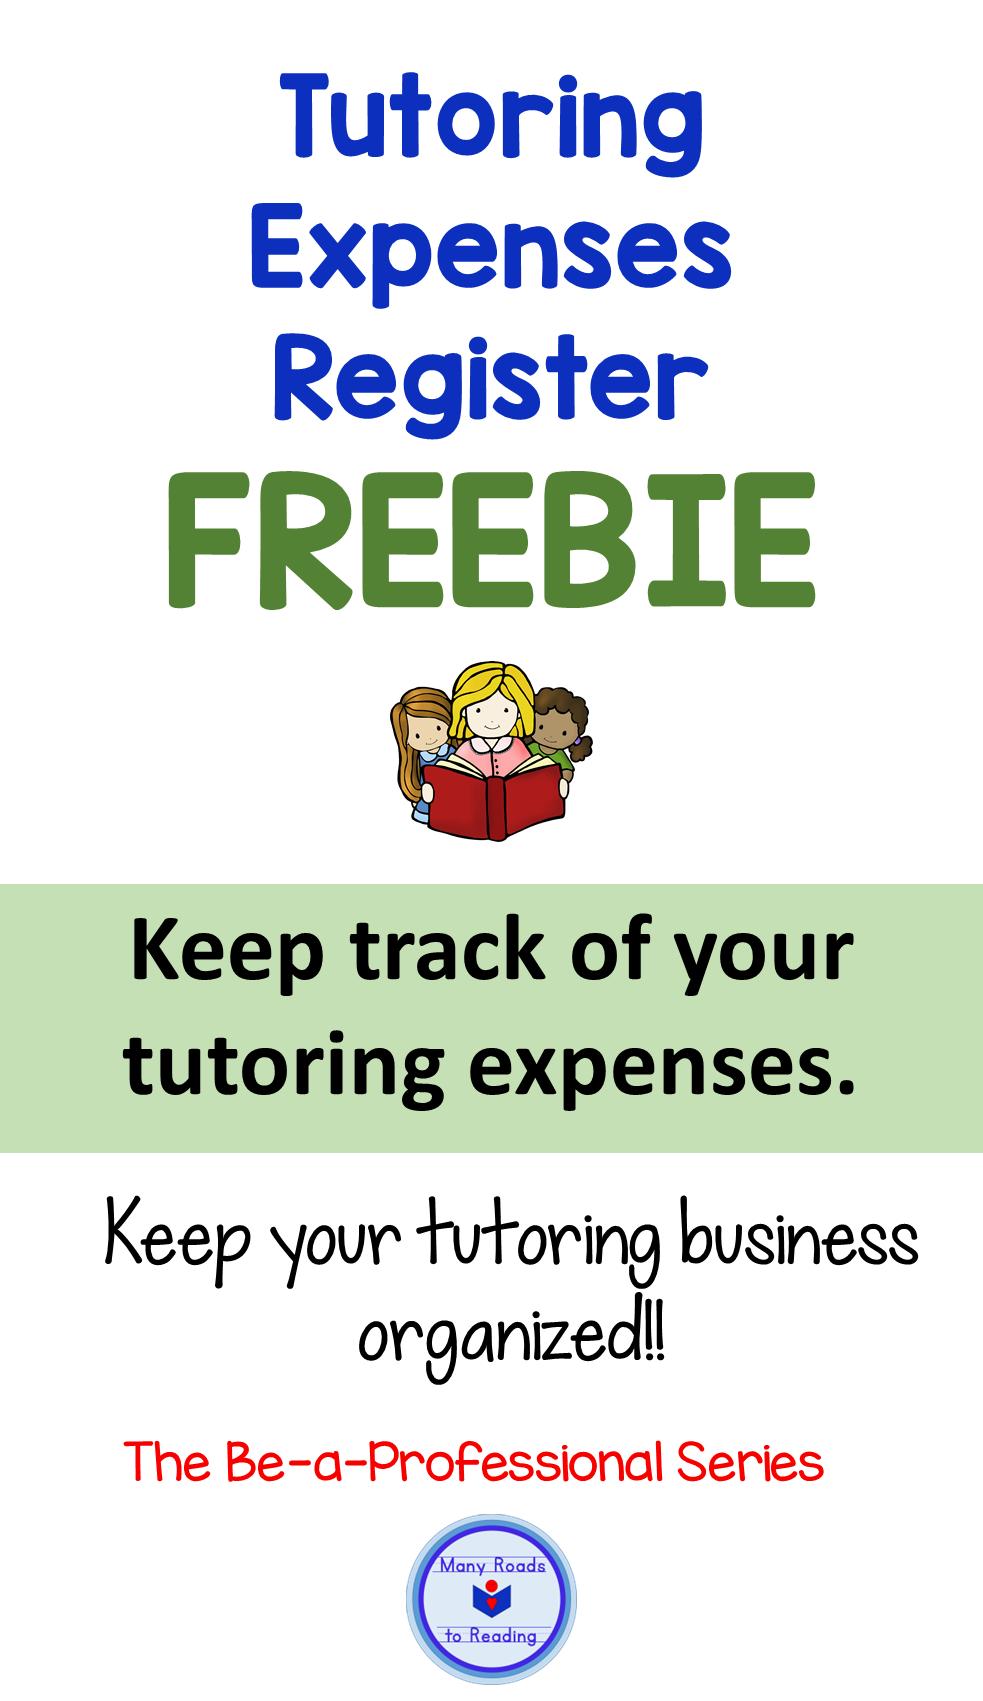 Tutoring Expenses Register Freebie Tutoring Business Online